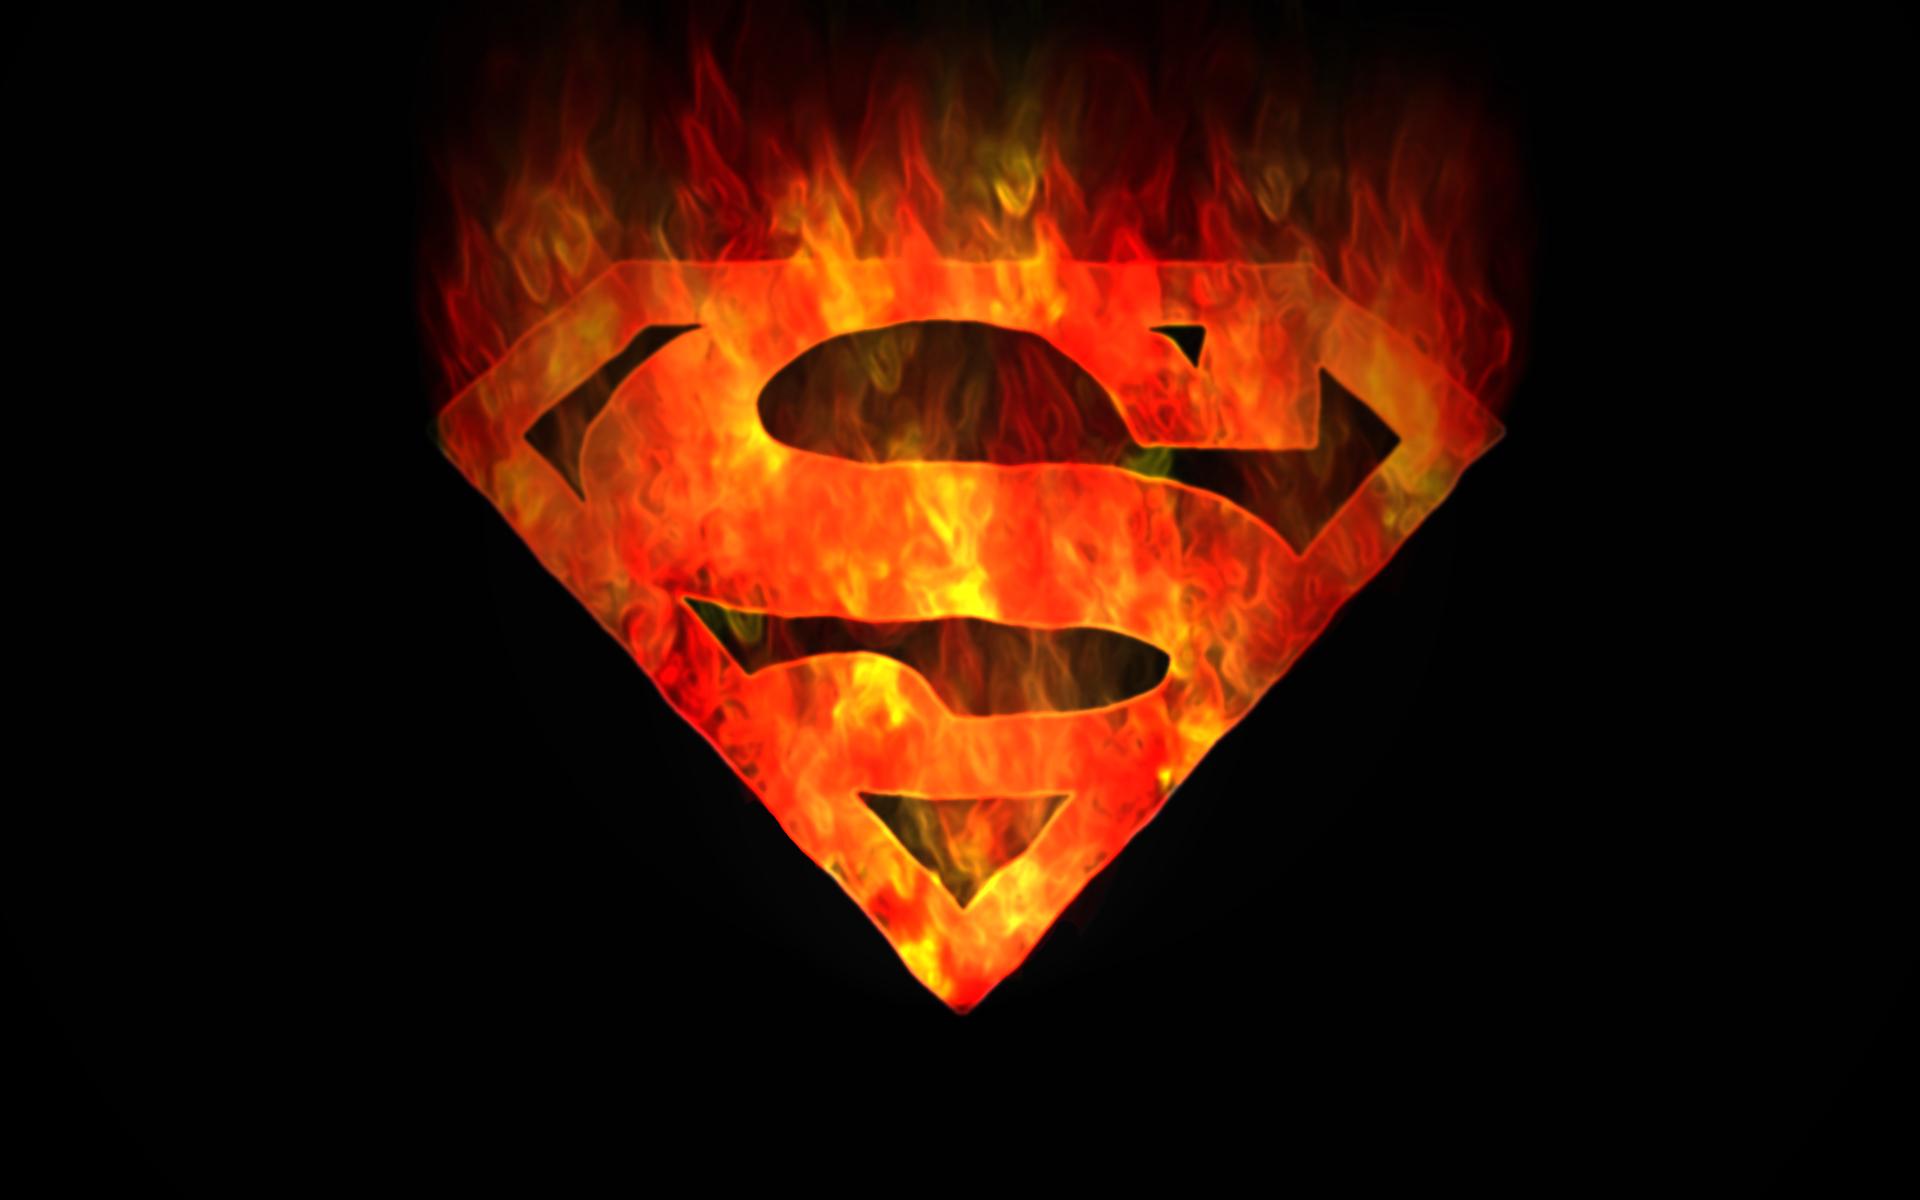 Logo Superman Wallpaper Hd Free Download Pixelstalknet